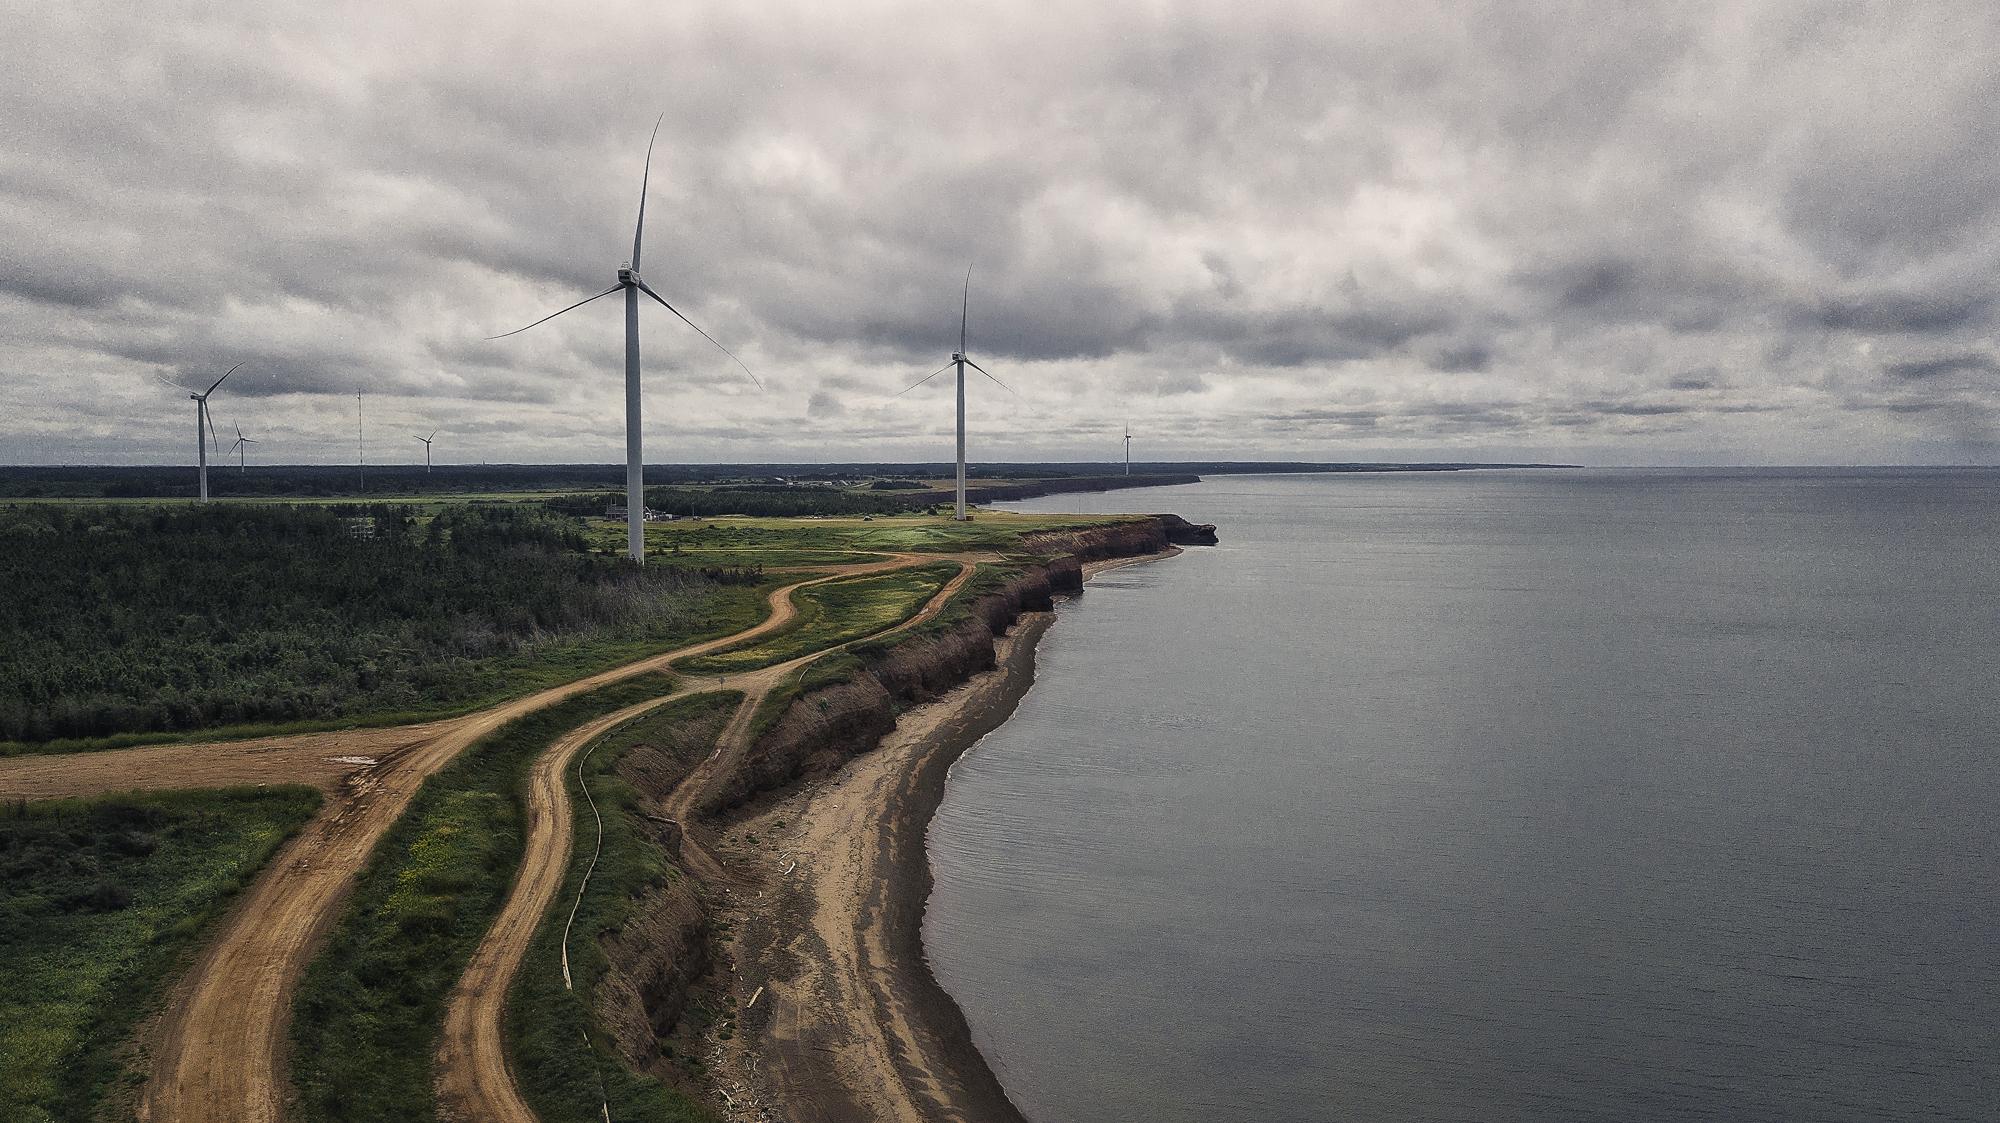 éolienne drone uav